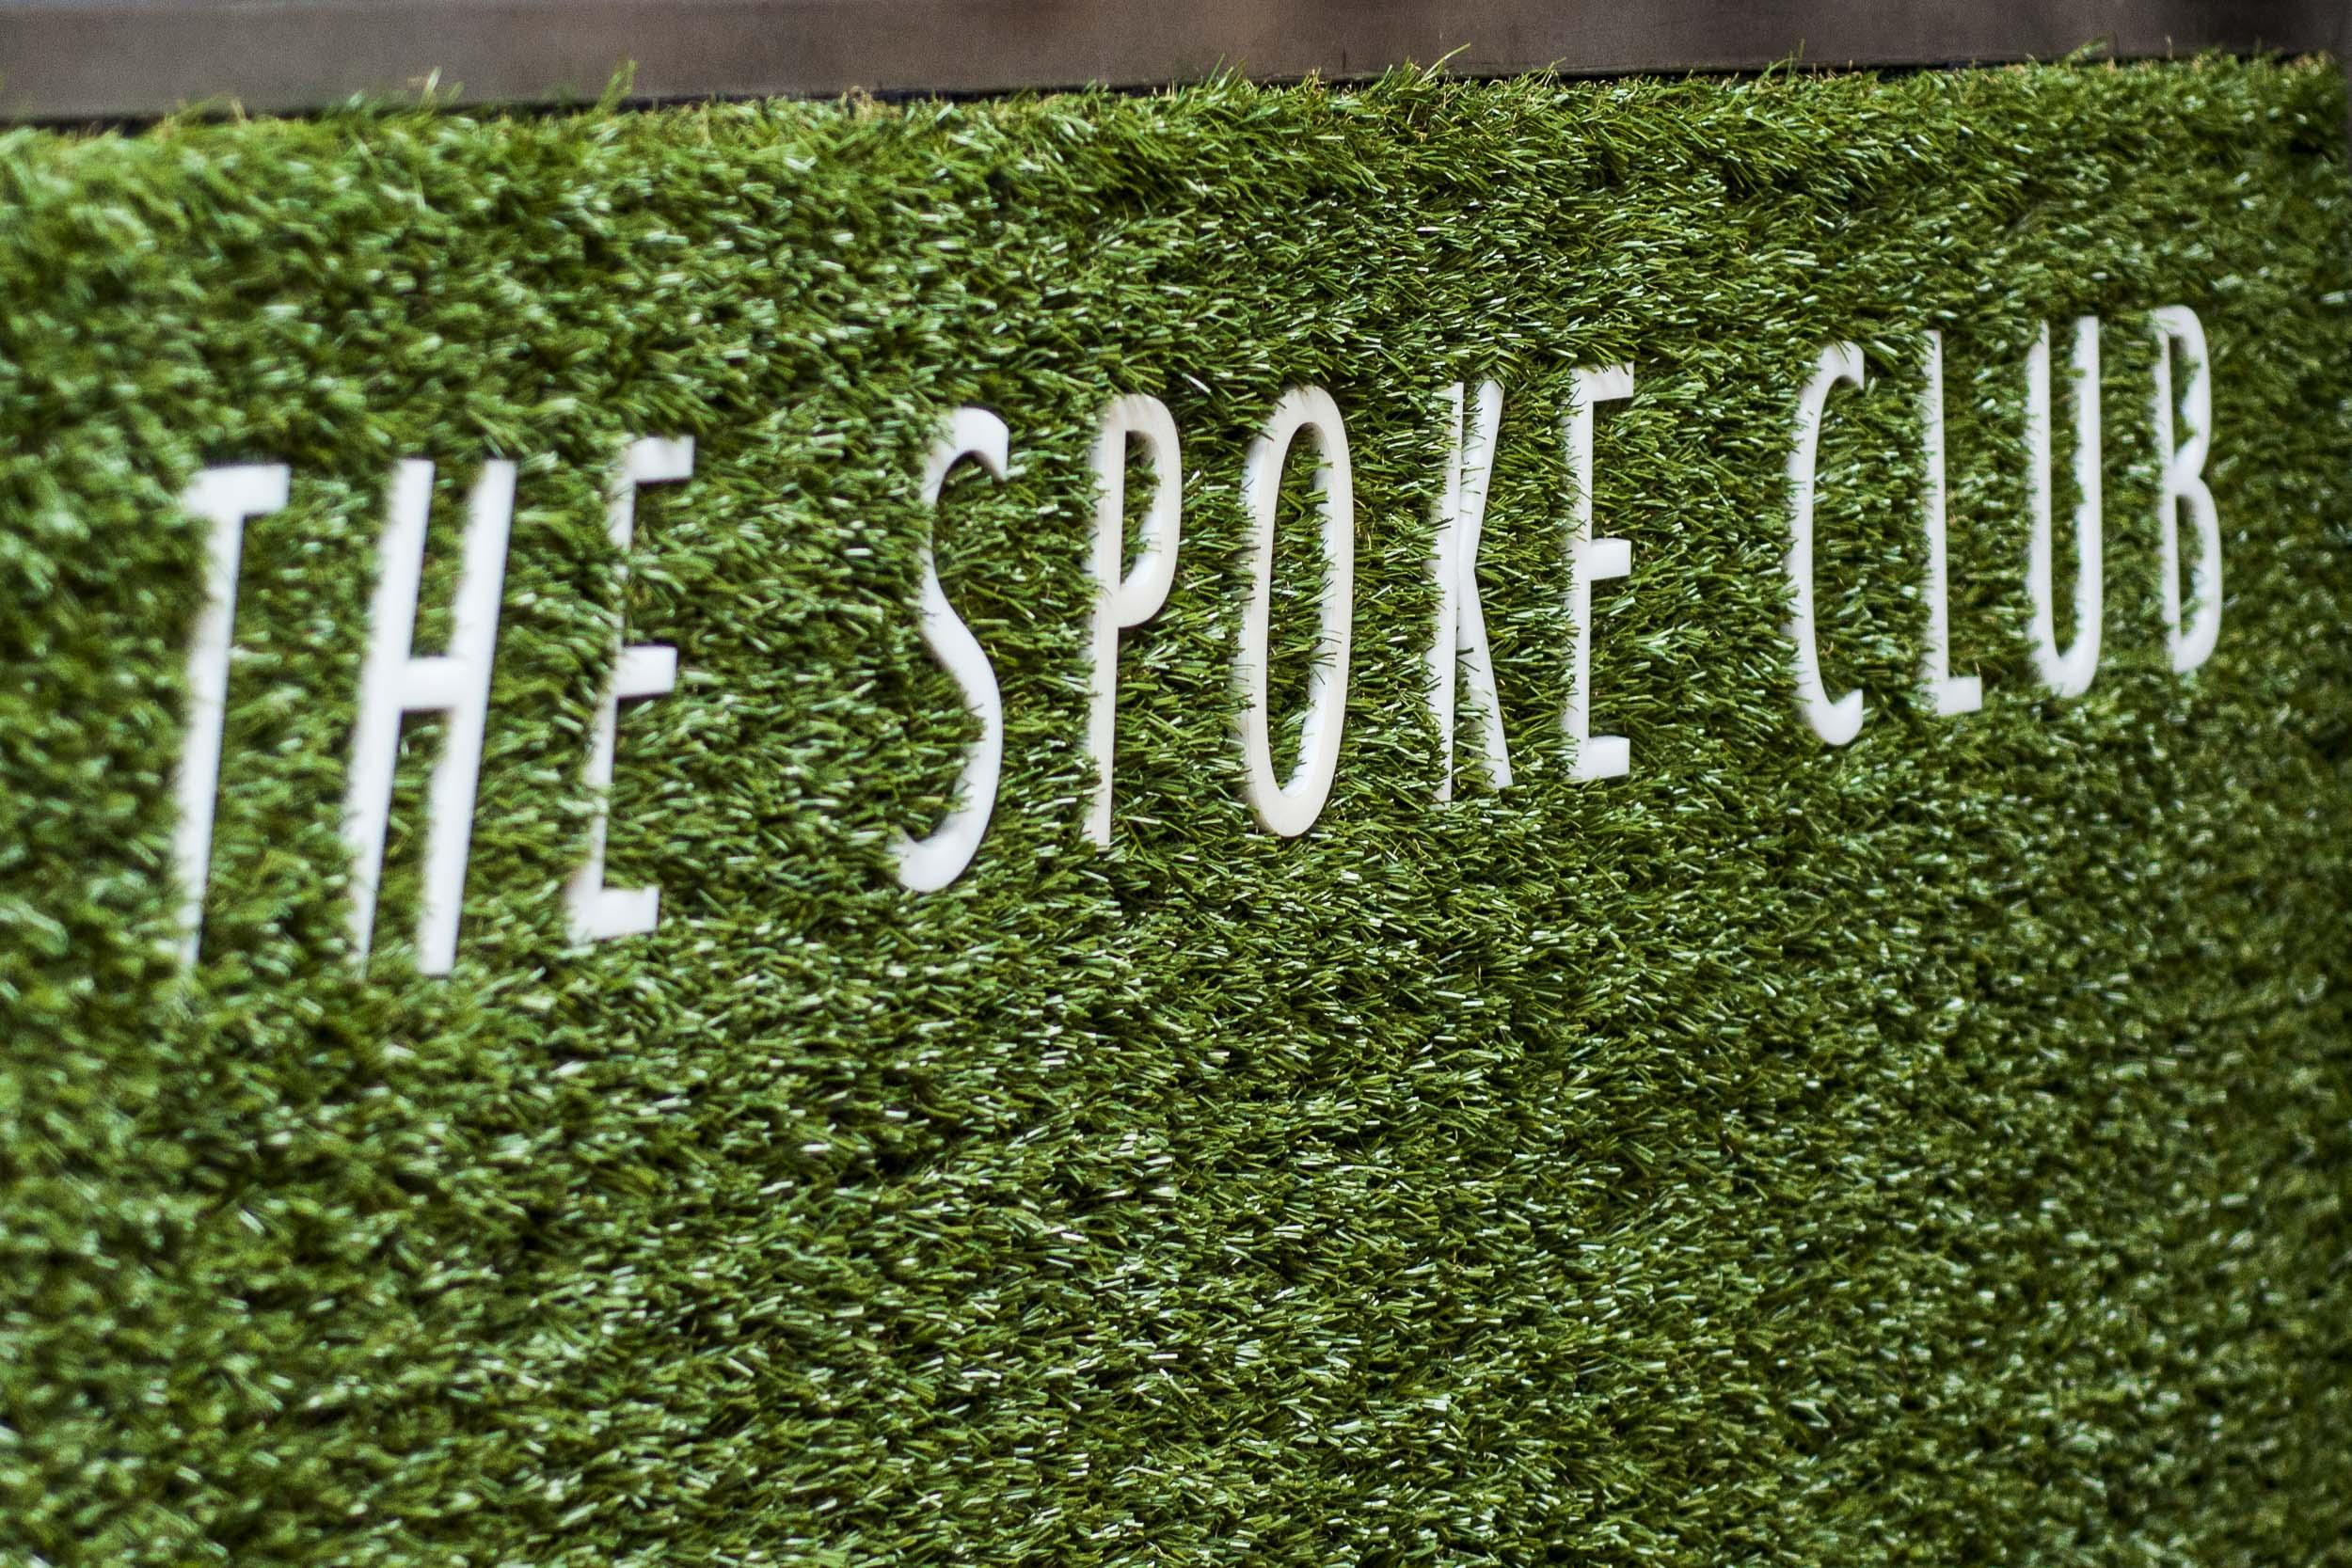 The Spoke Club - A Rewording Word-7959.jpg